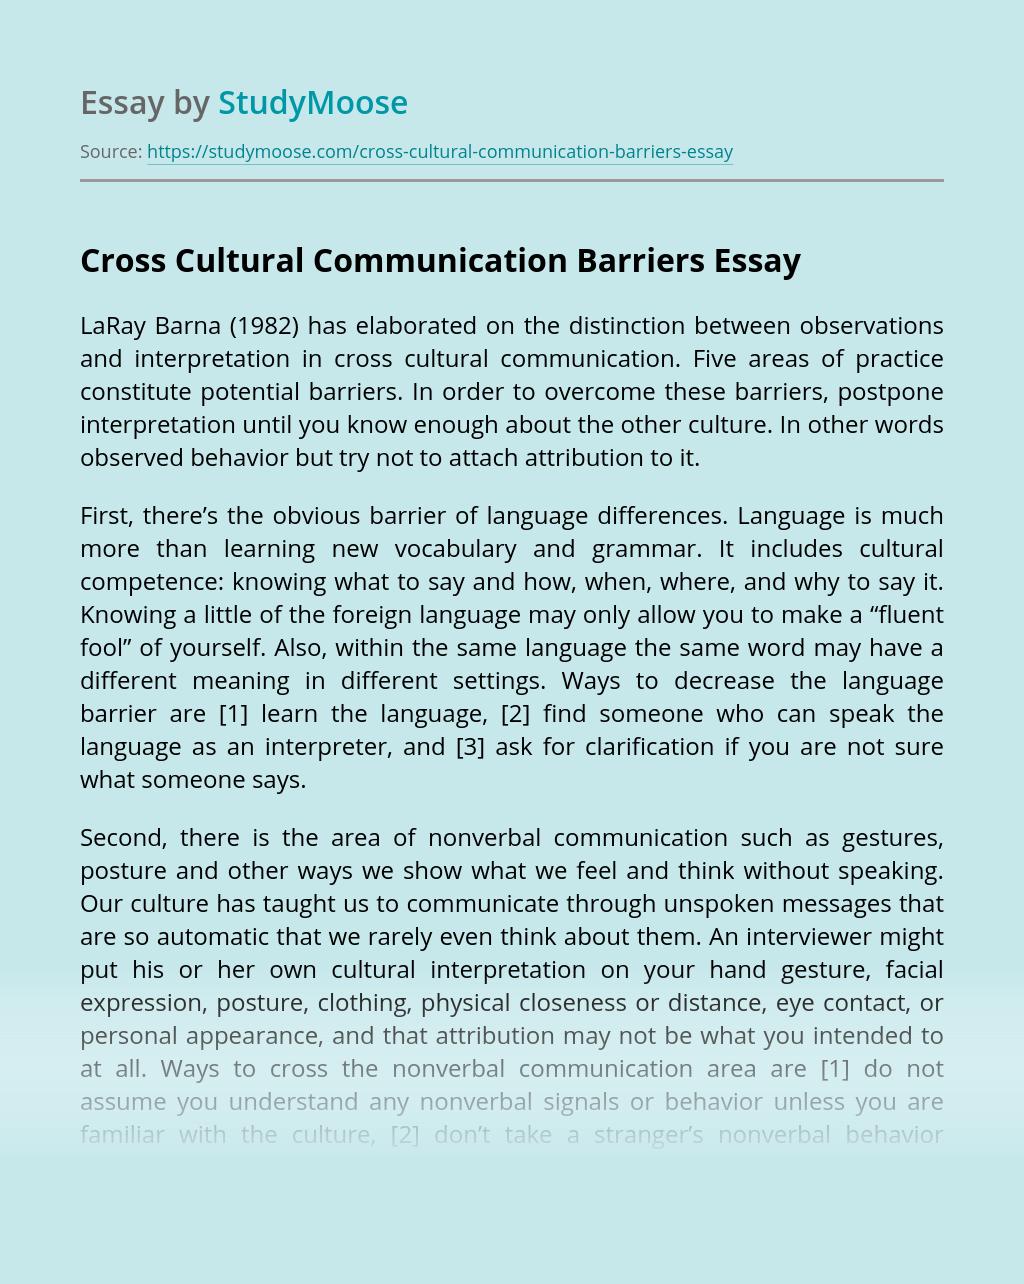 Cross Cultural Communication Barriers